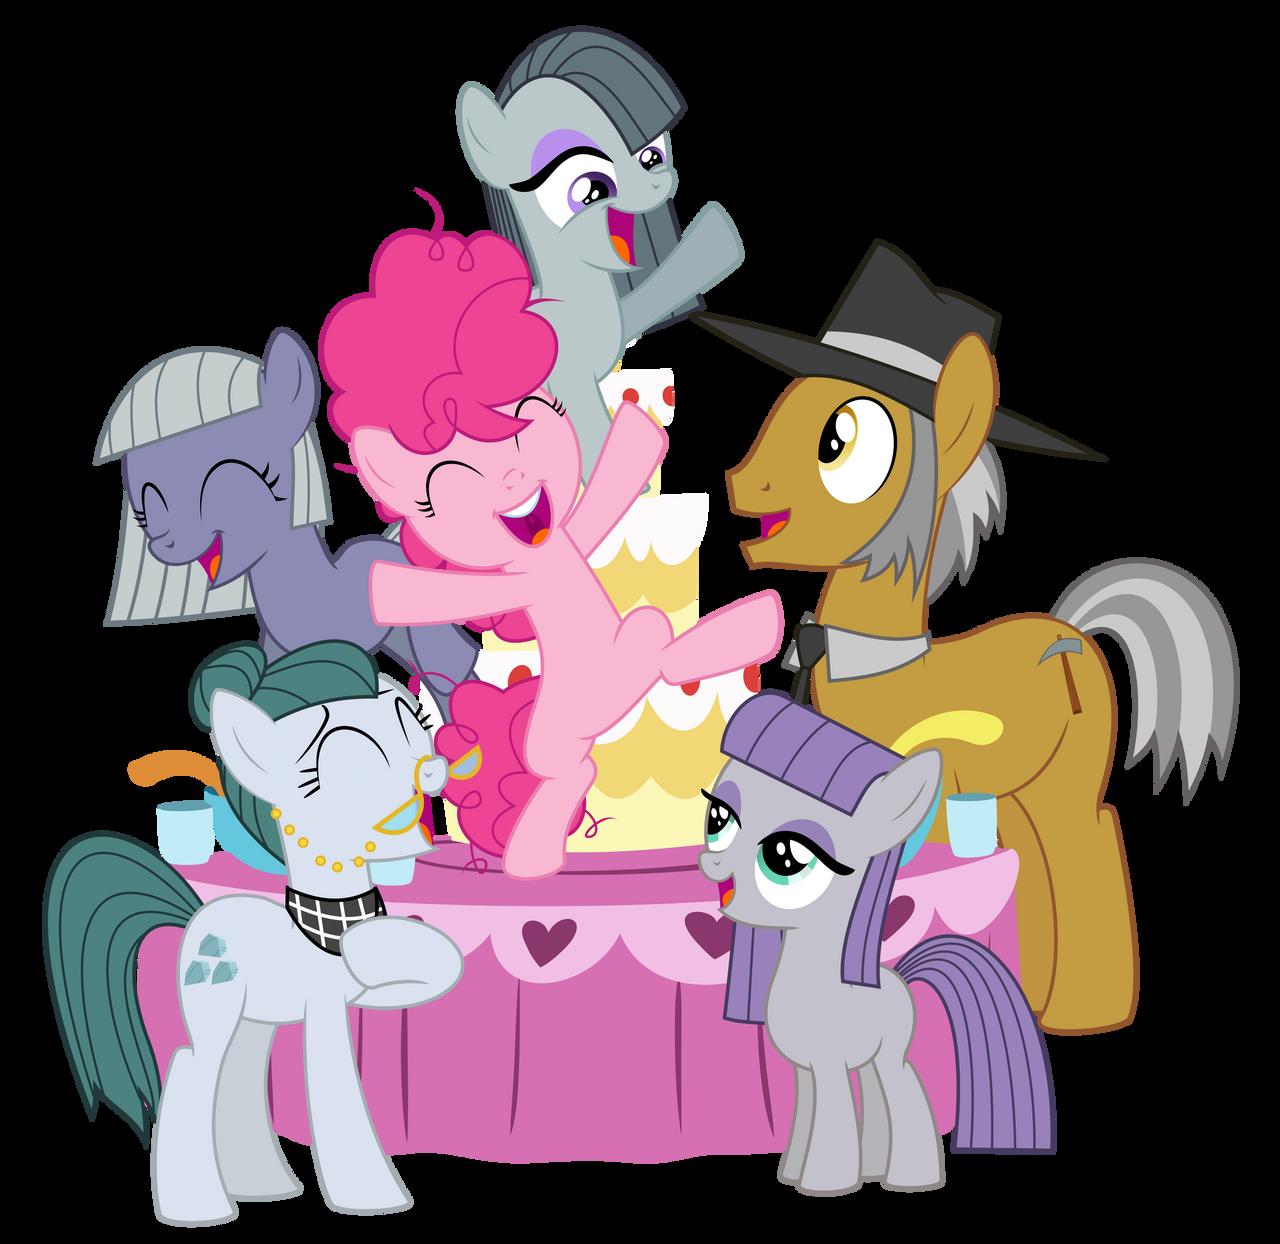 My Family Pie